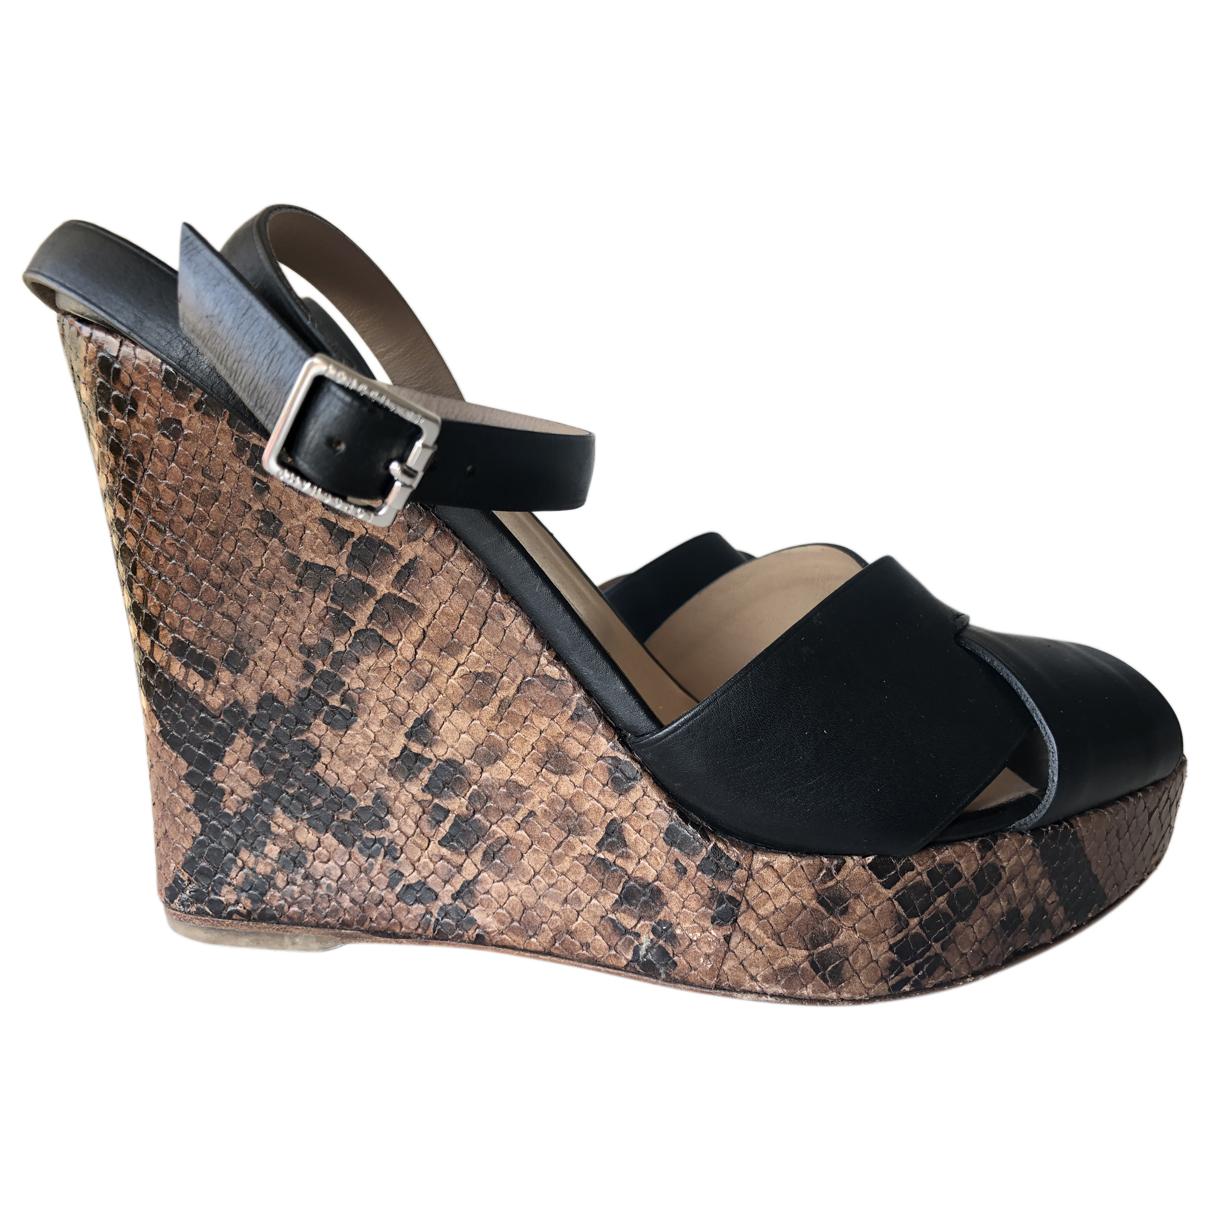 Longchamp \N Black Leather Sandals for Women 37 EU